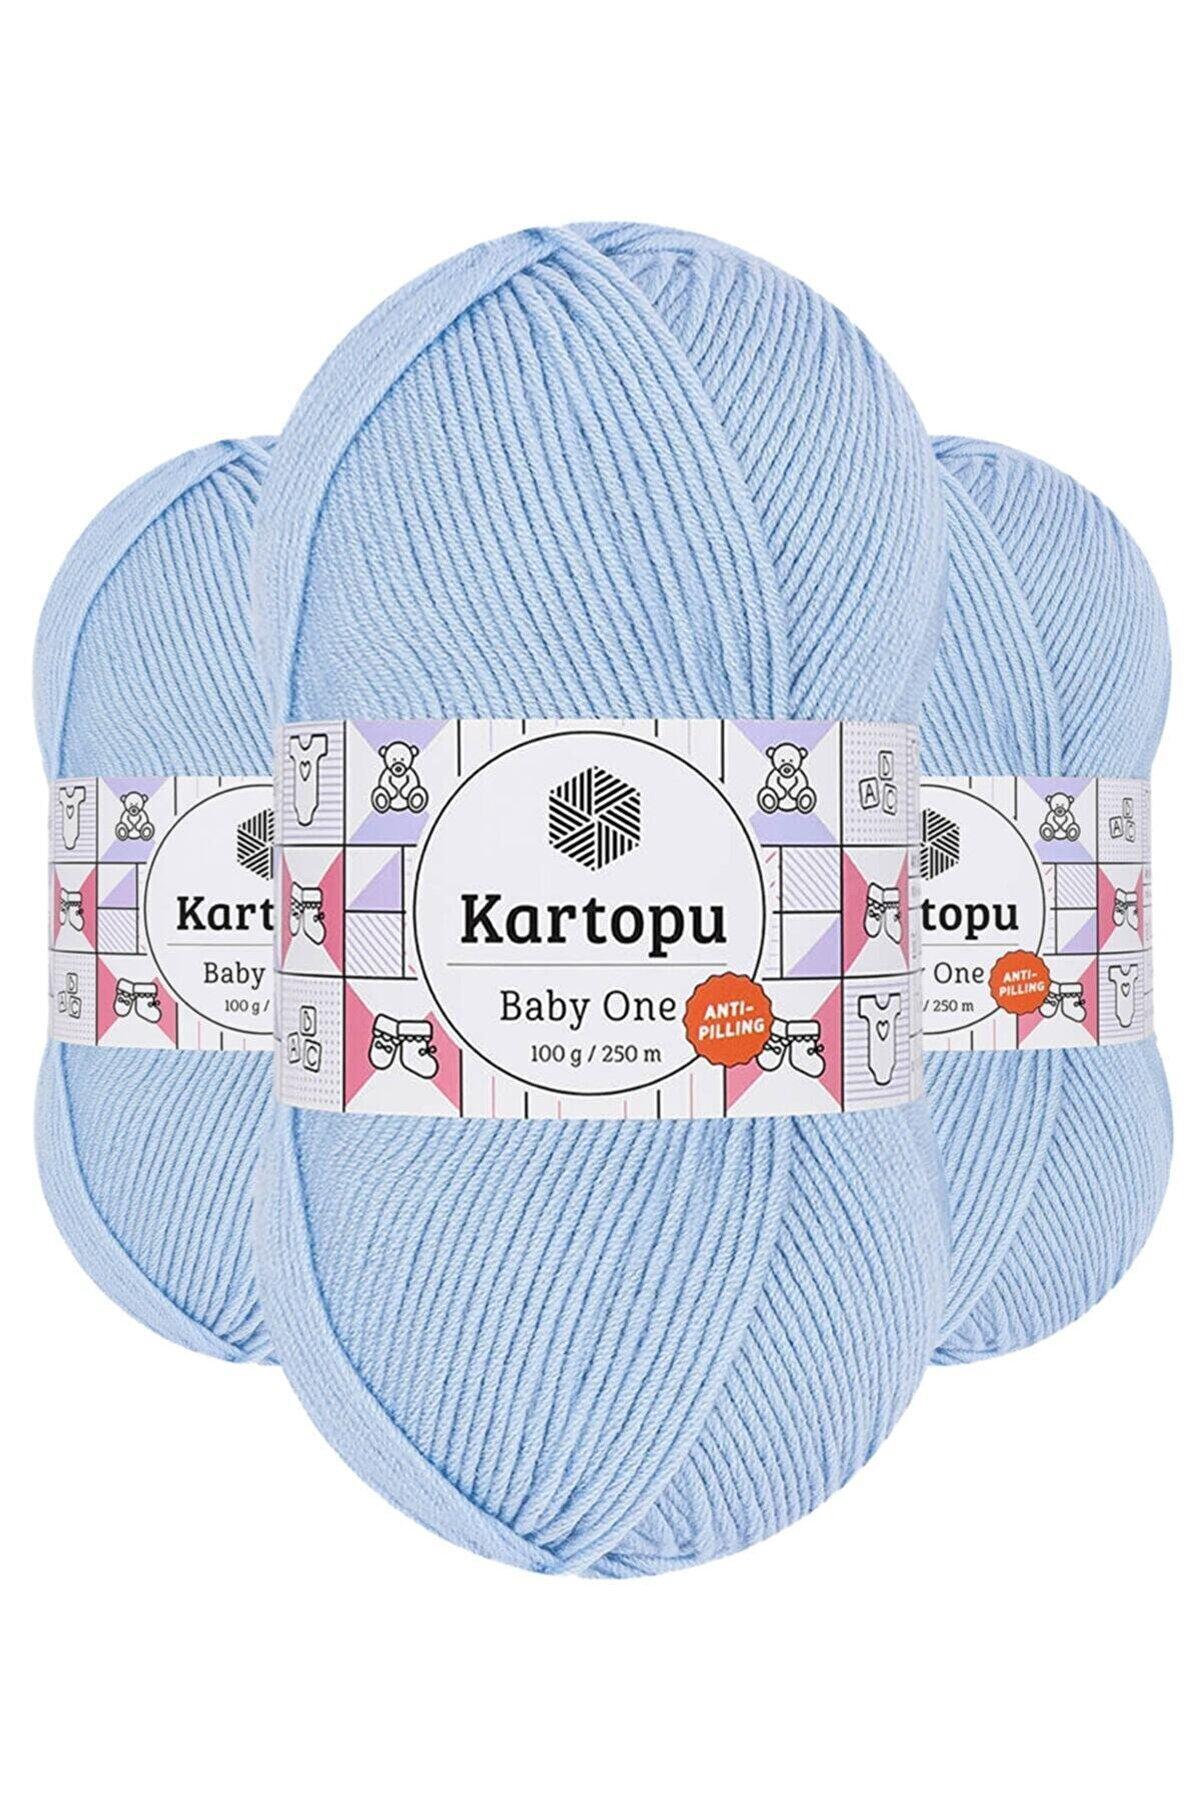 Kartopu Baby One K544 (bebe Mavi) Anti-pilling El Örgü Ipi/yünü 1 Adet